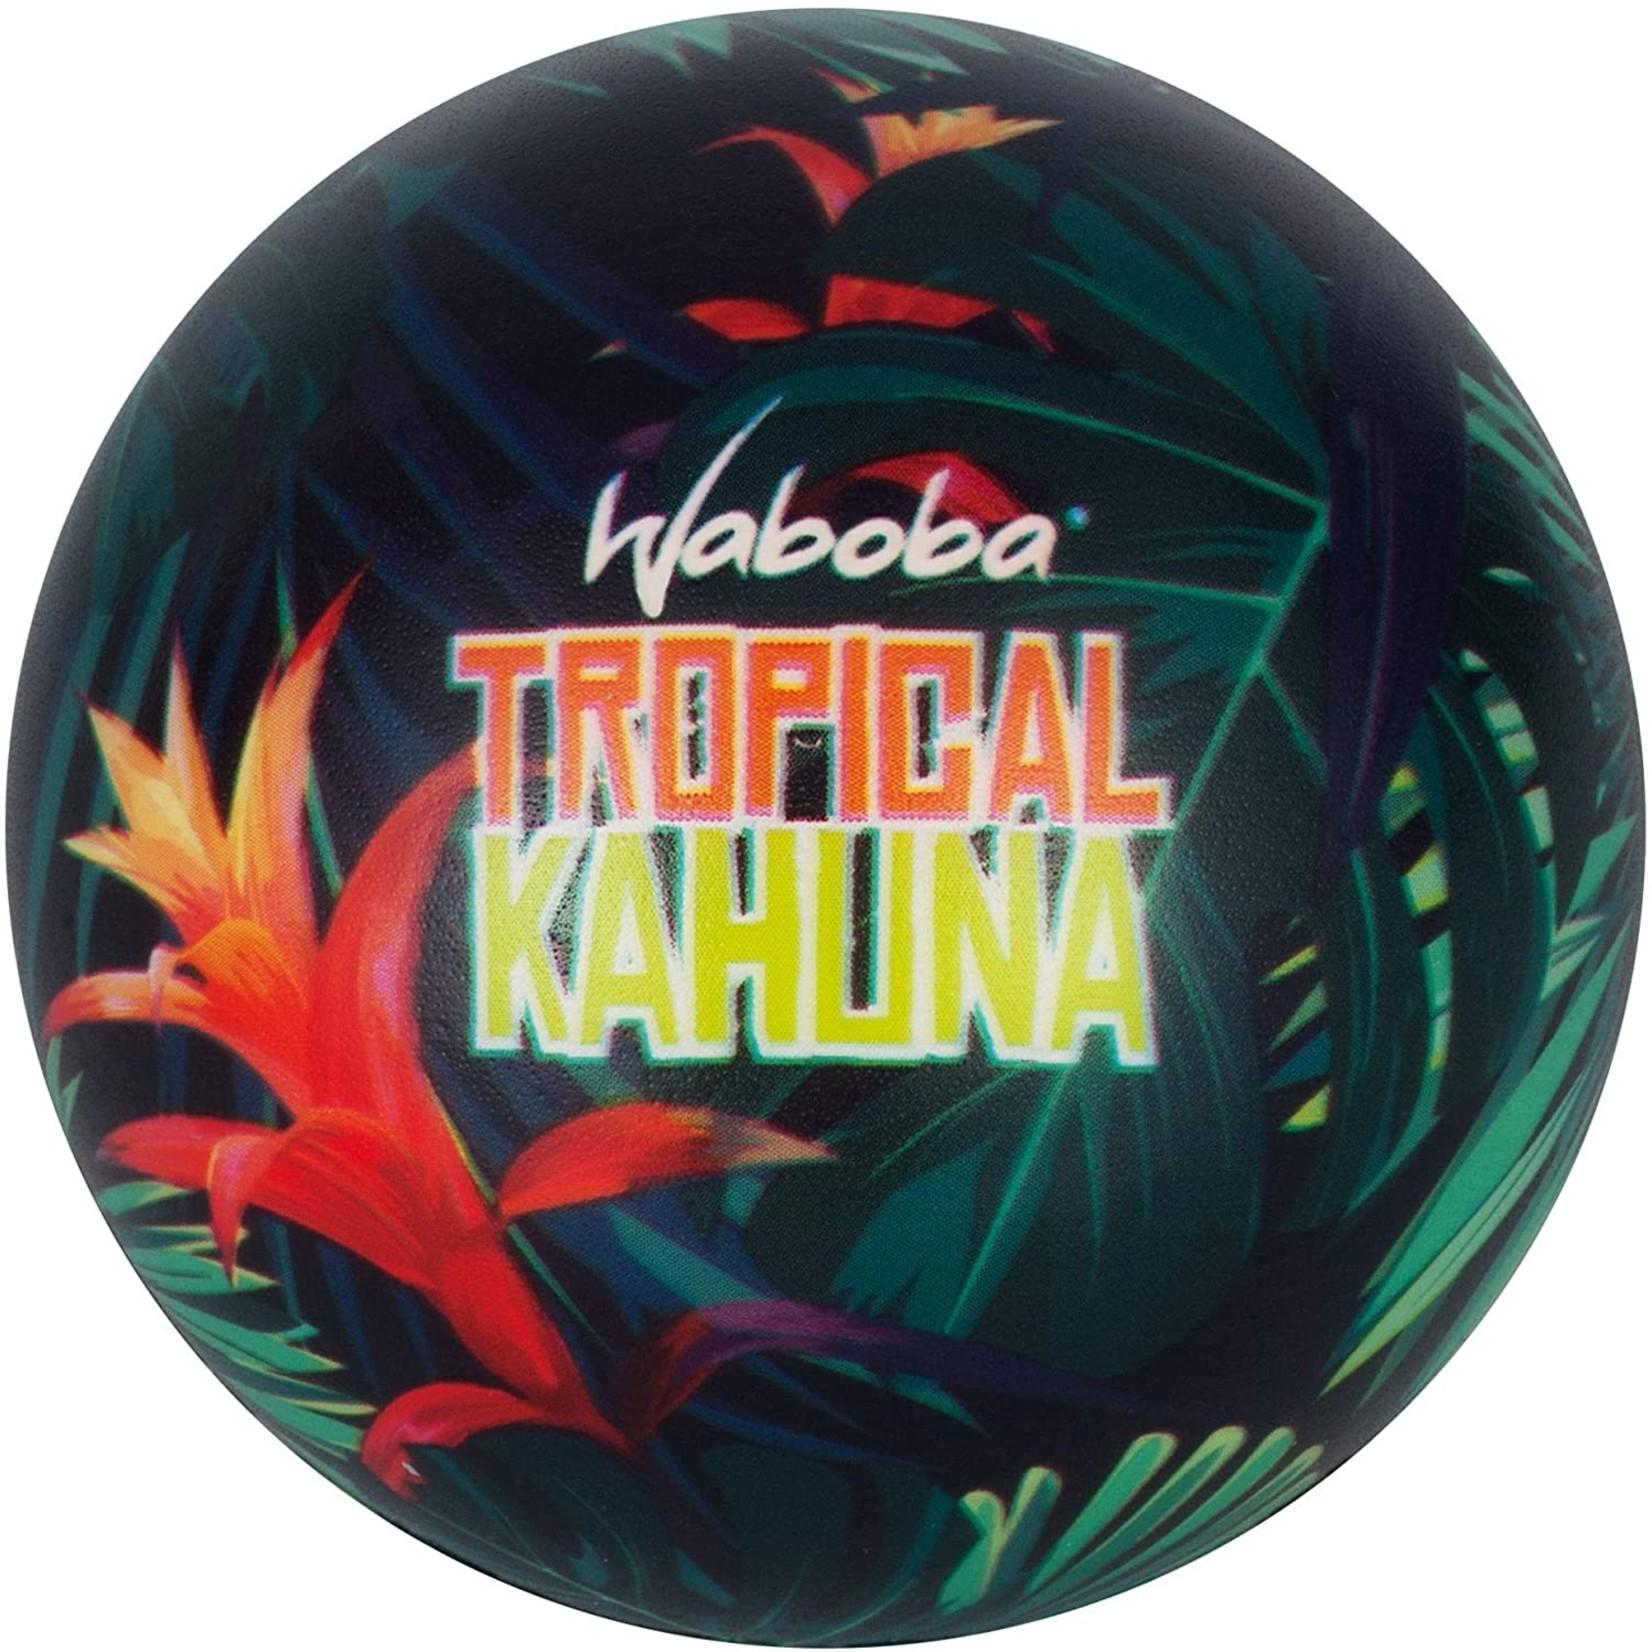 Waboba Tropical Kahuna Water Ball